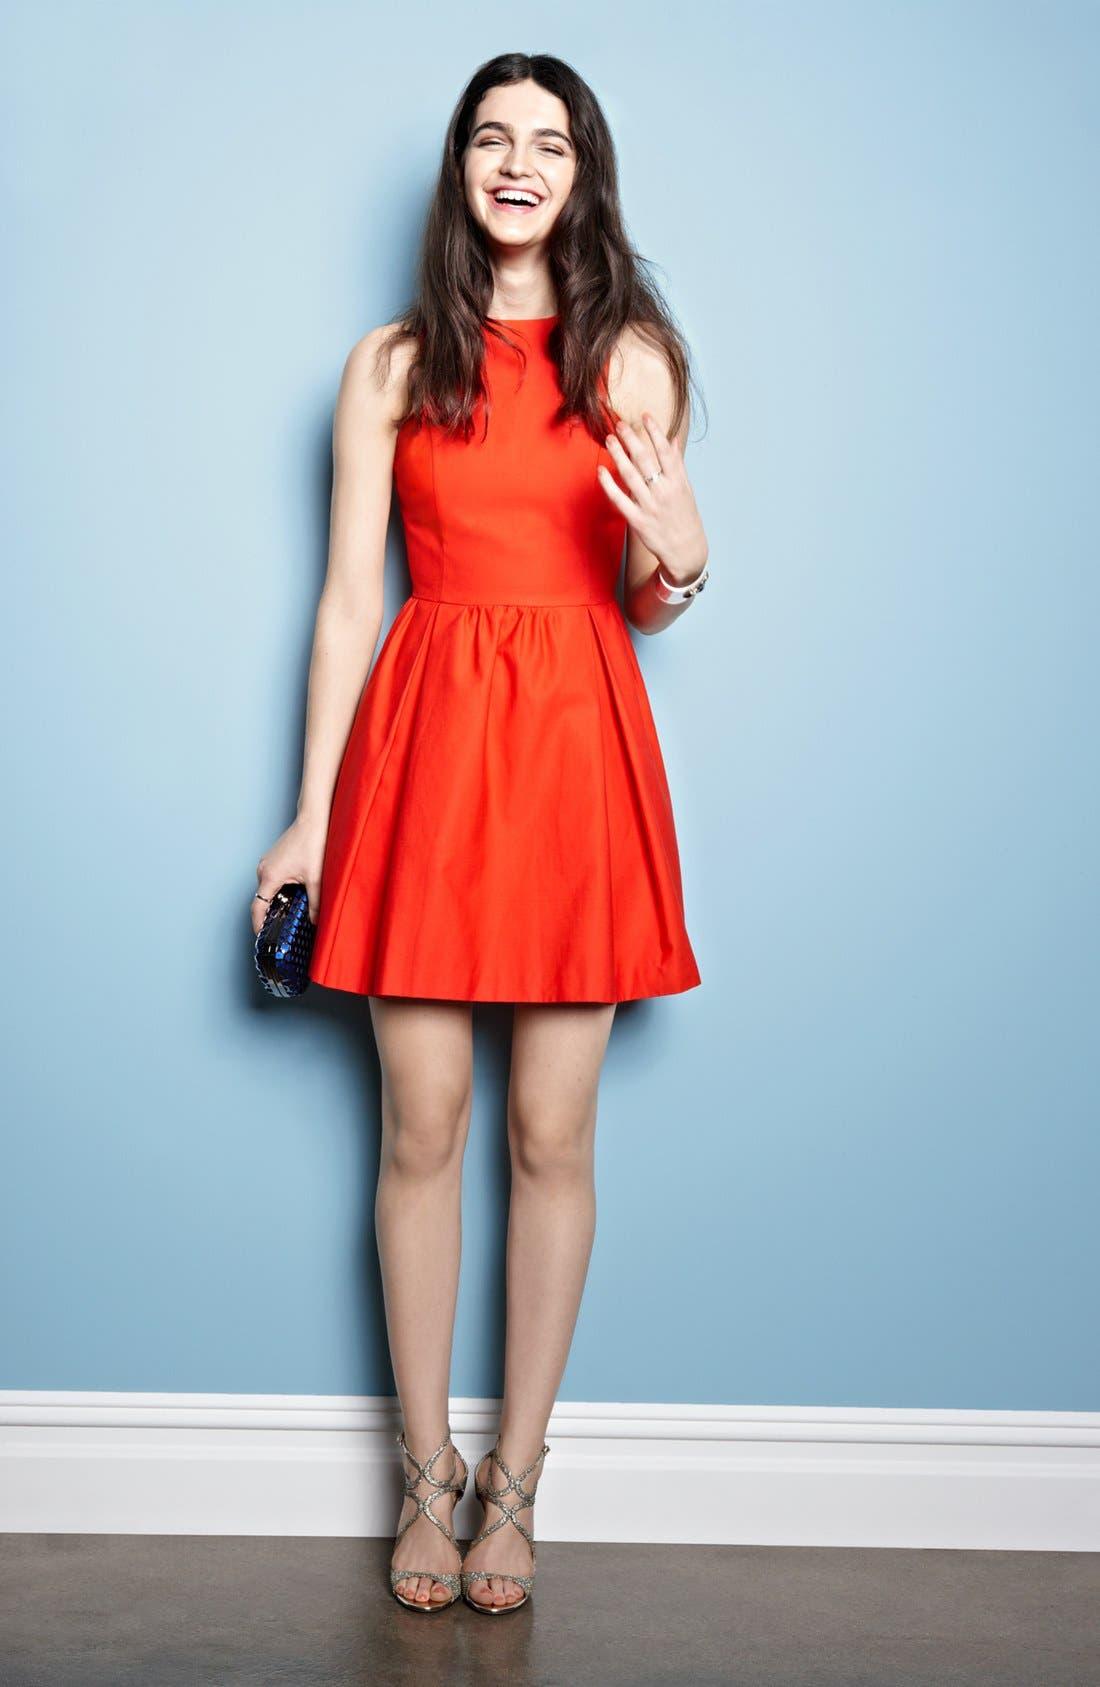 Alternate Image 1 Selected - BB Dakota Cotton Dress & Accessories